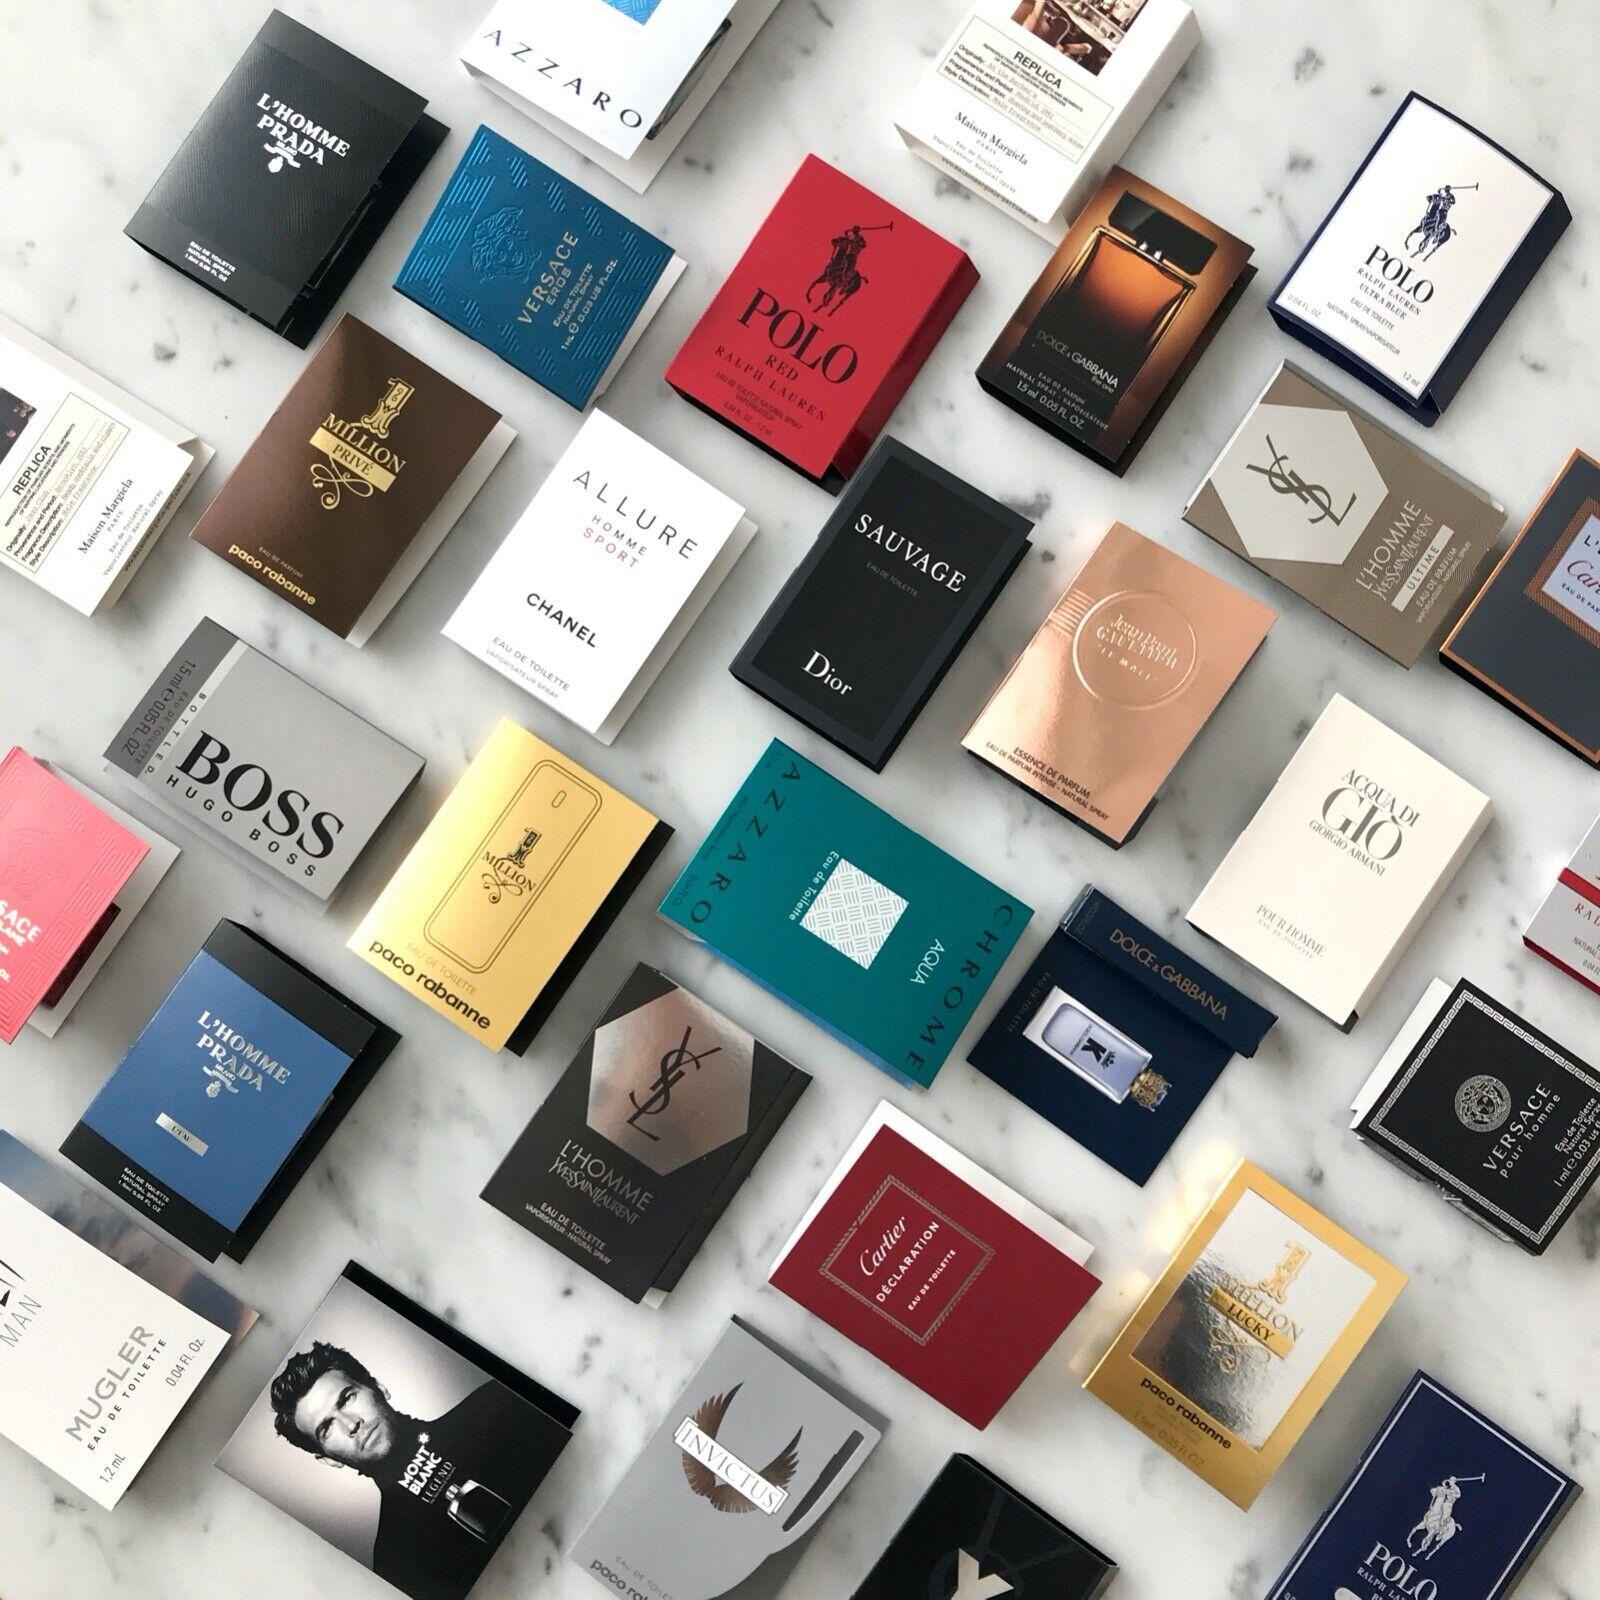 Men Designer Perfume Sample Vials 1 Choose Scents Combined Shipping